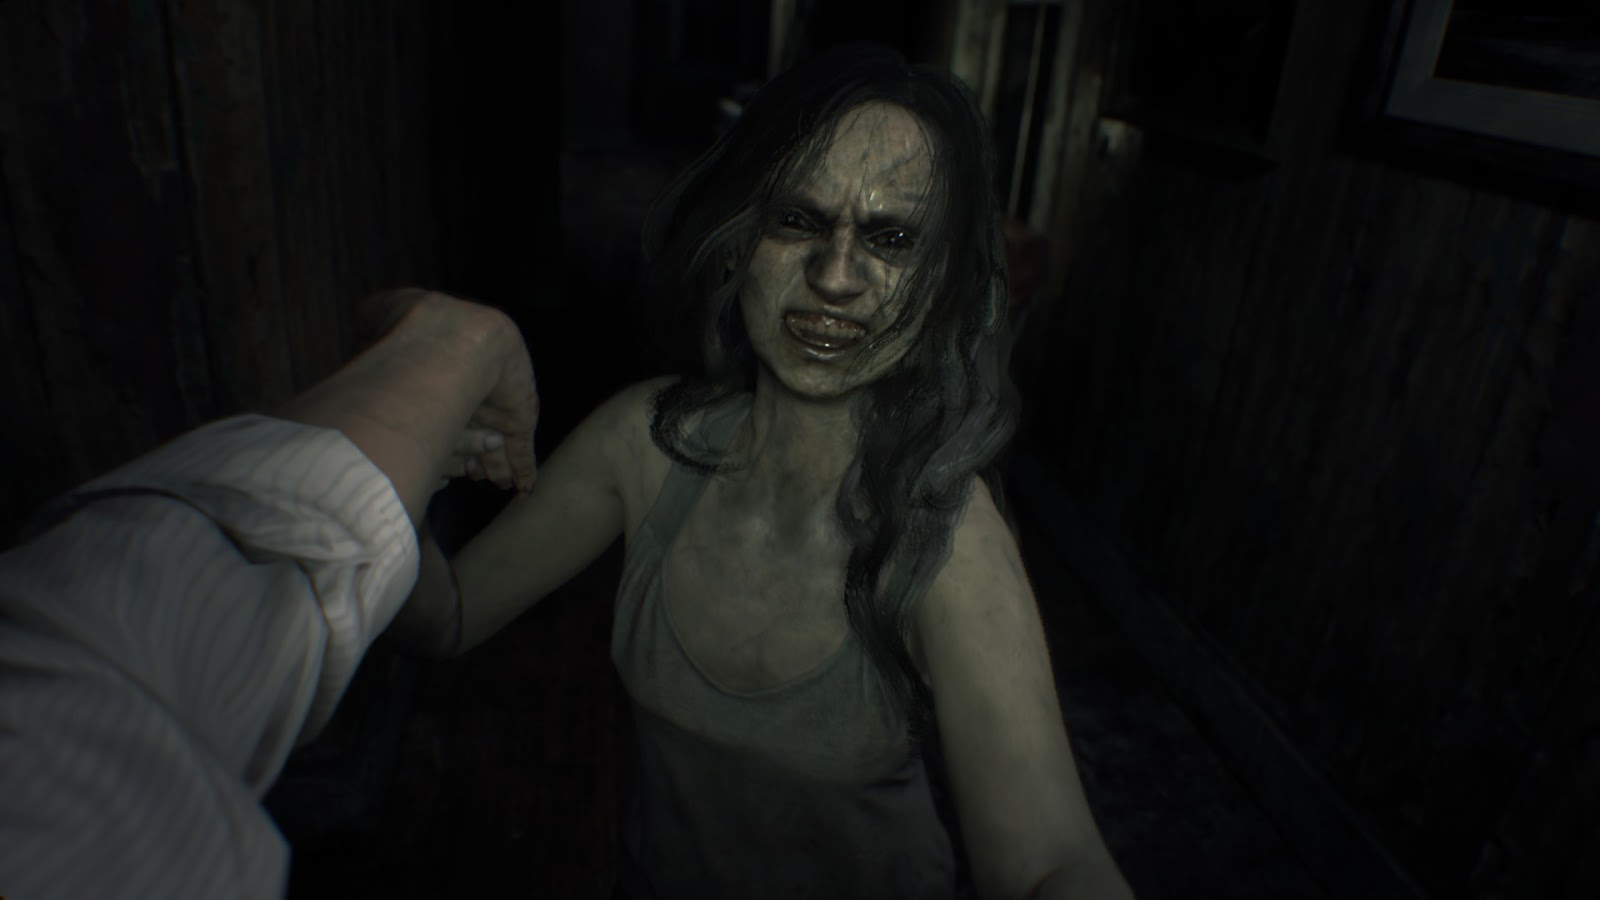 The Nocturnal Rambler Resident Evil 7 Survival Horror S Back